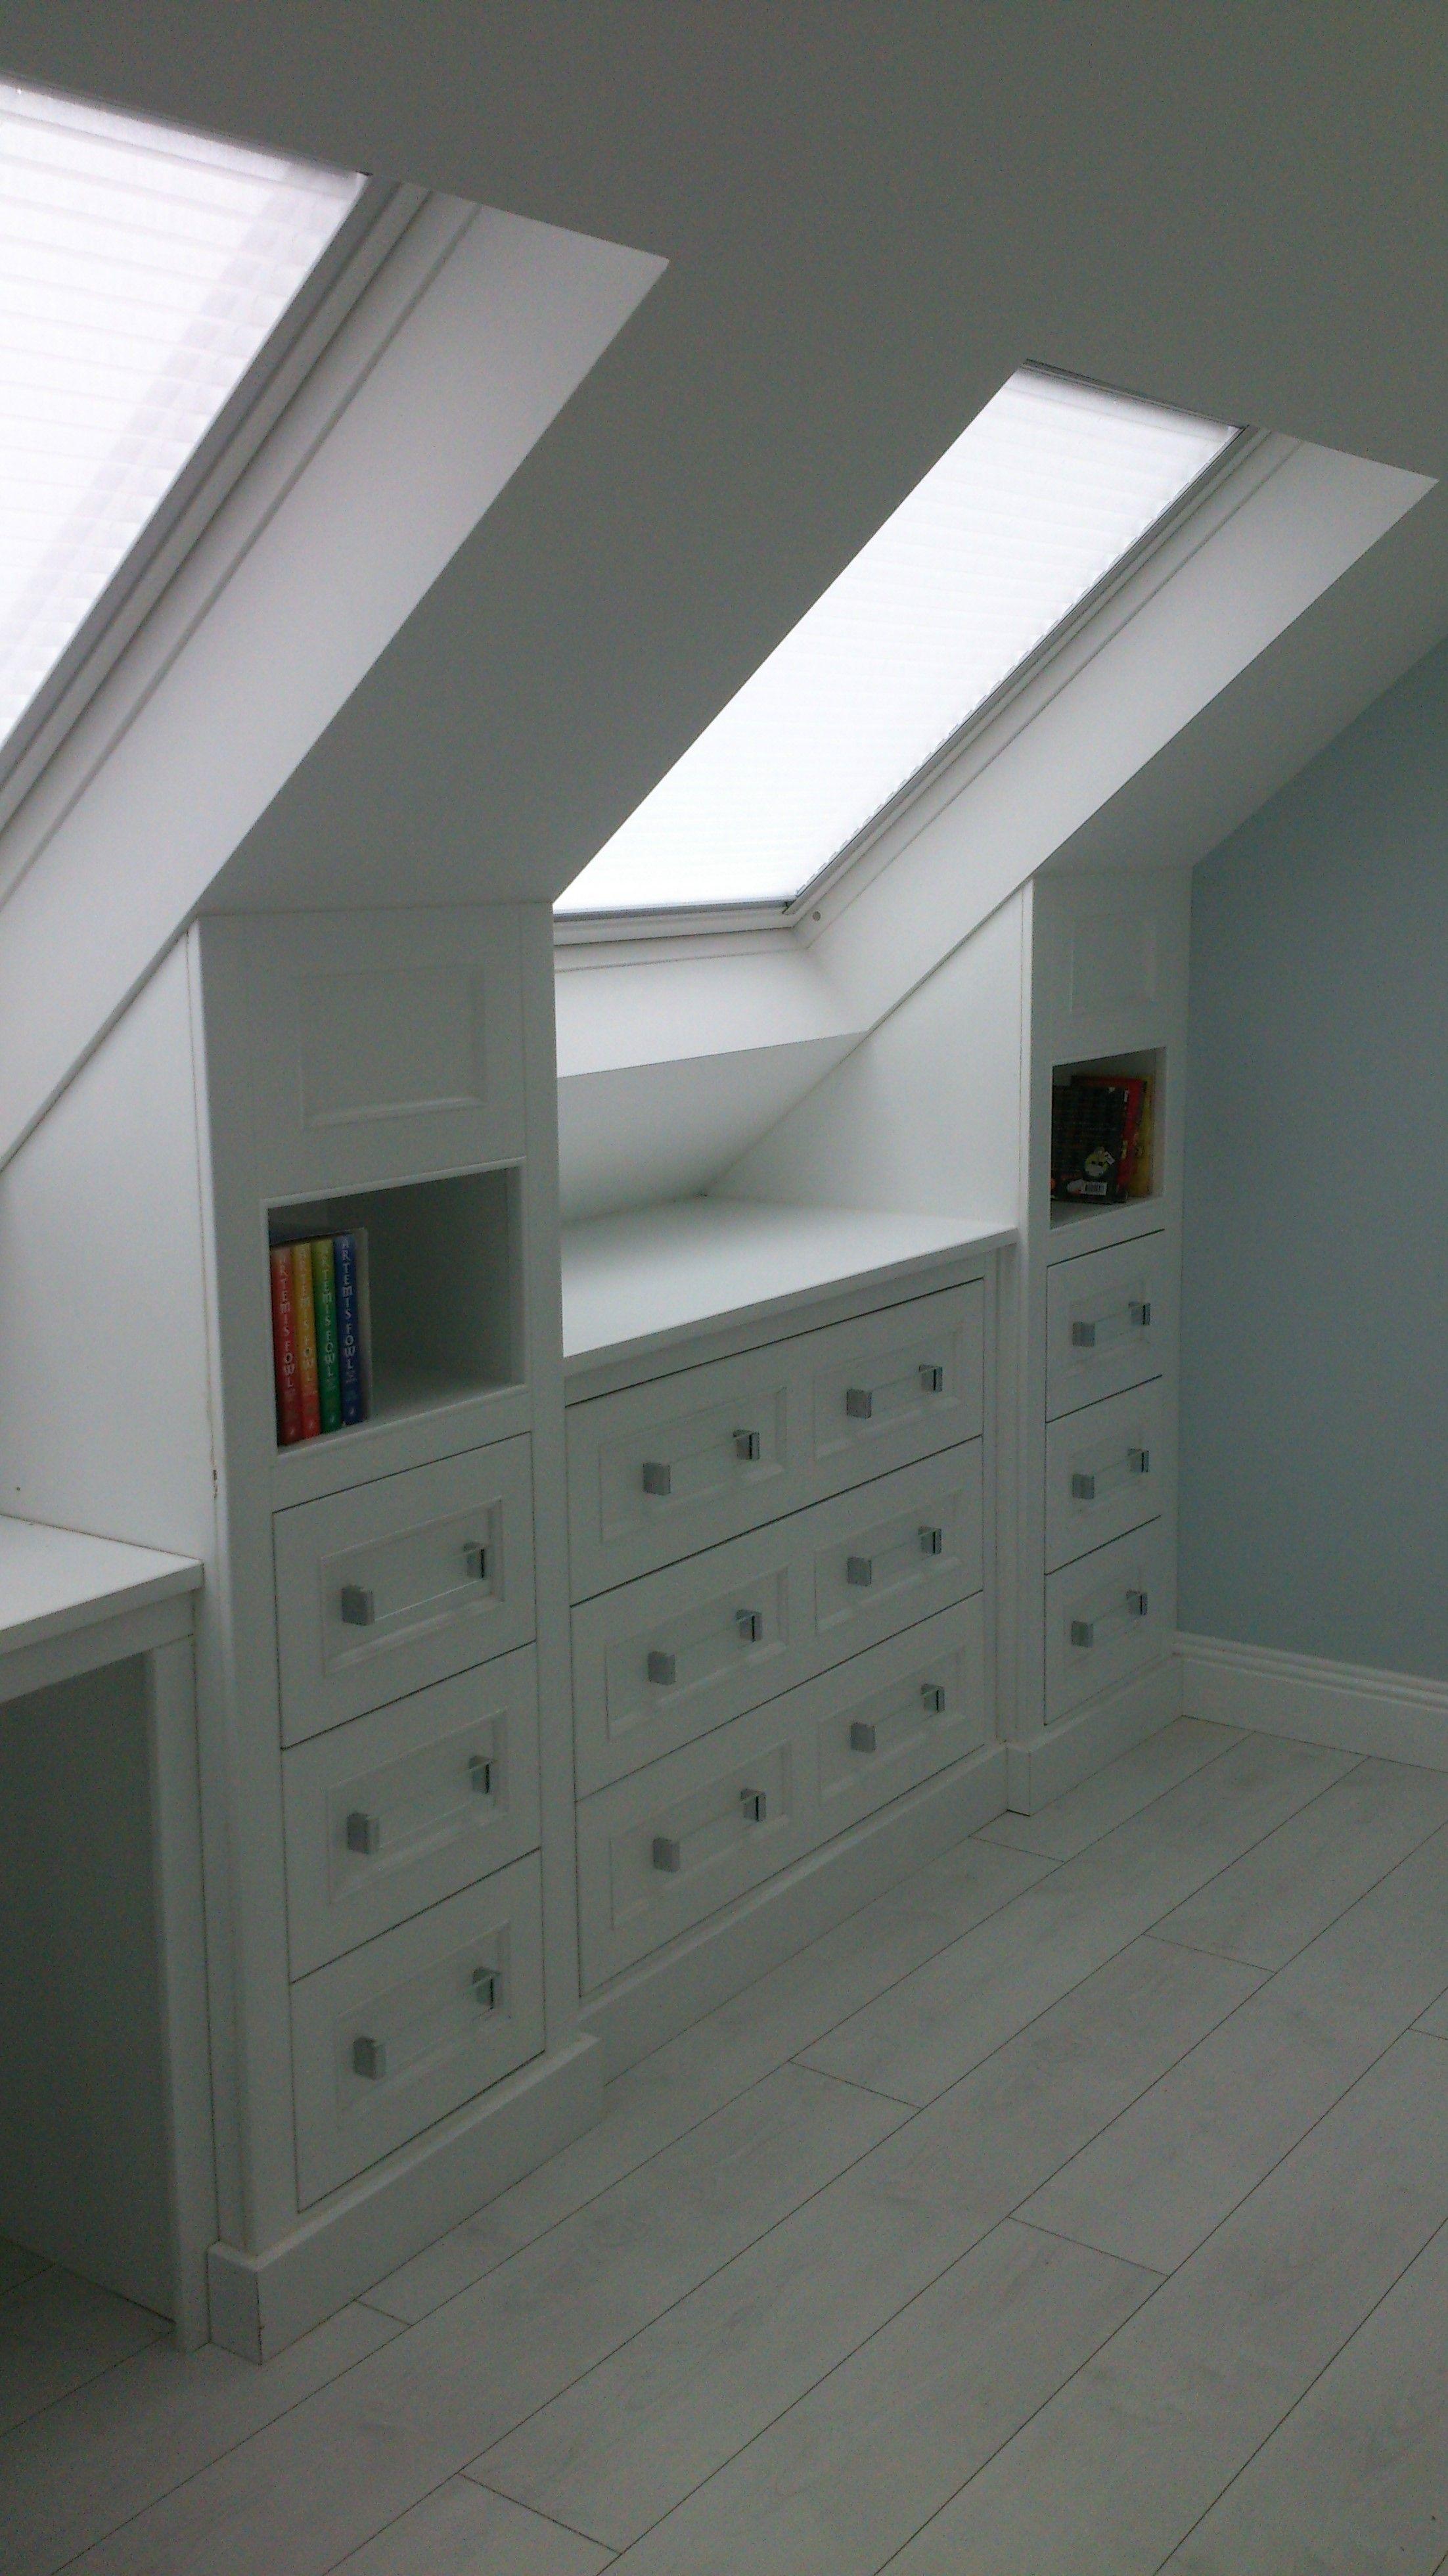 Bedroom ideas for loft rooms  attic storage with workdesk  Design  Pinterest  Attic storage